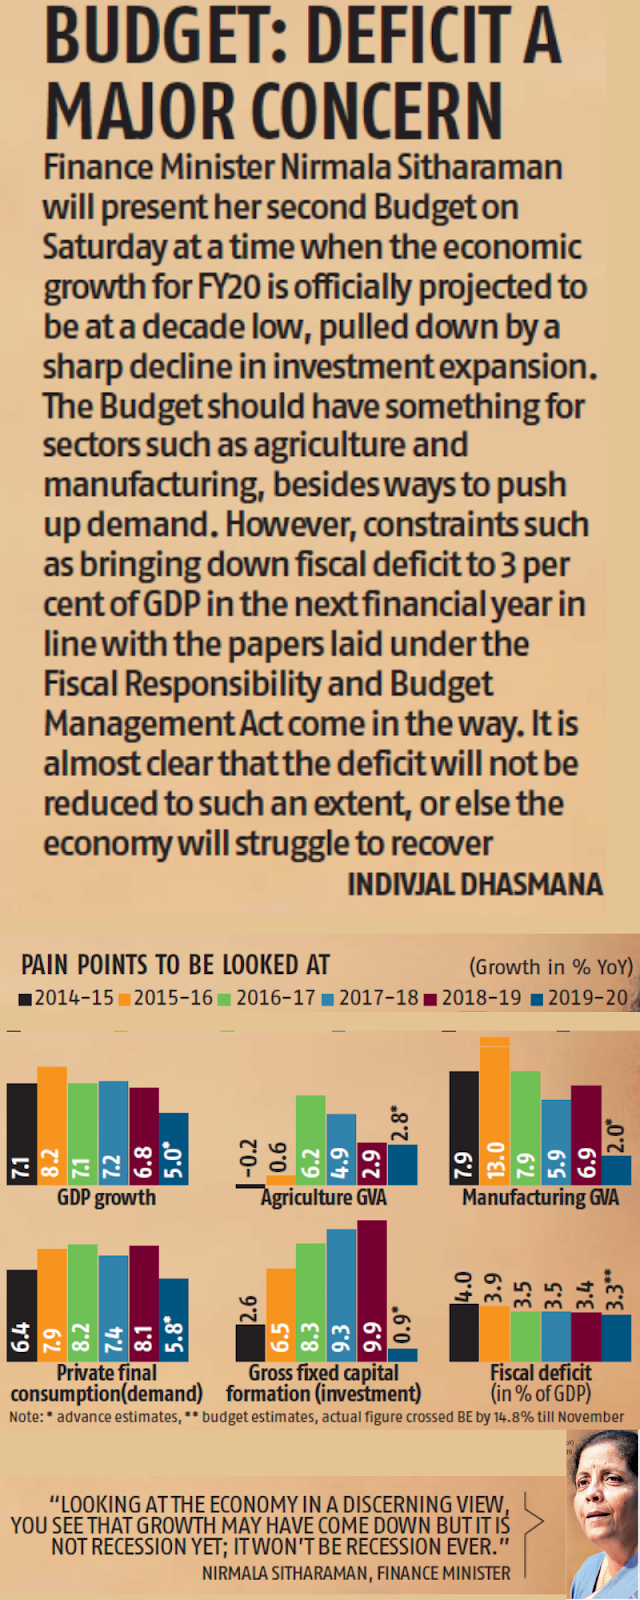 Budget 2020: Deficit A Major Concern Infographic